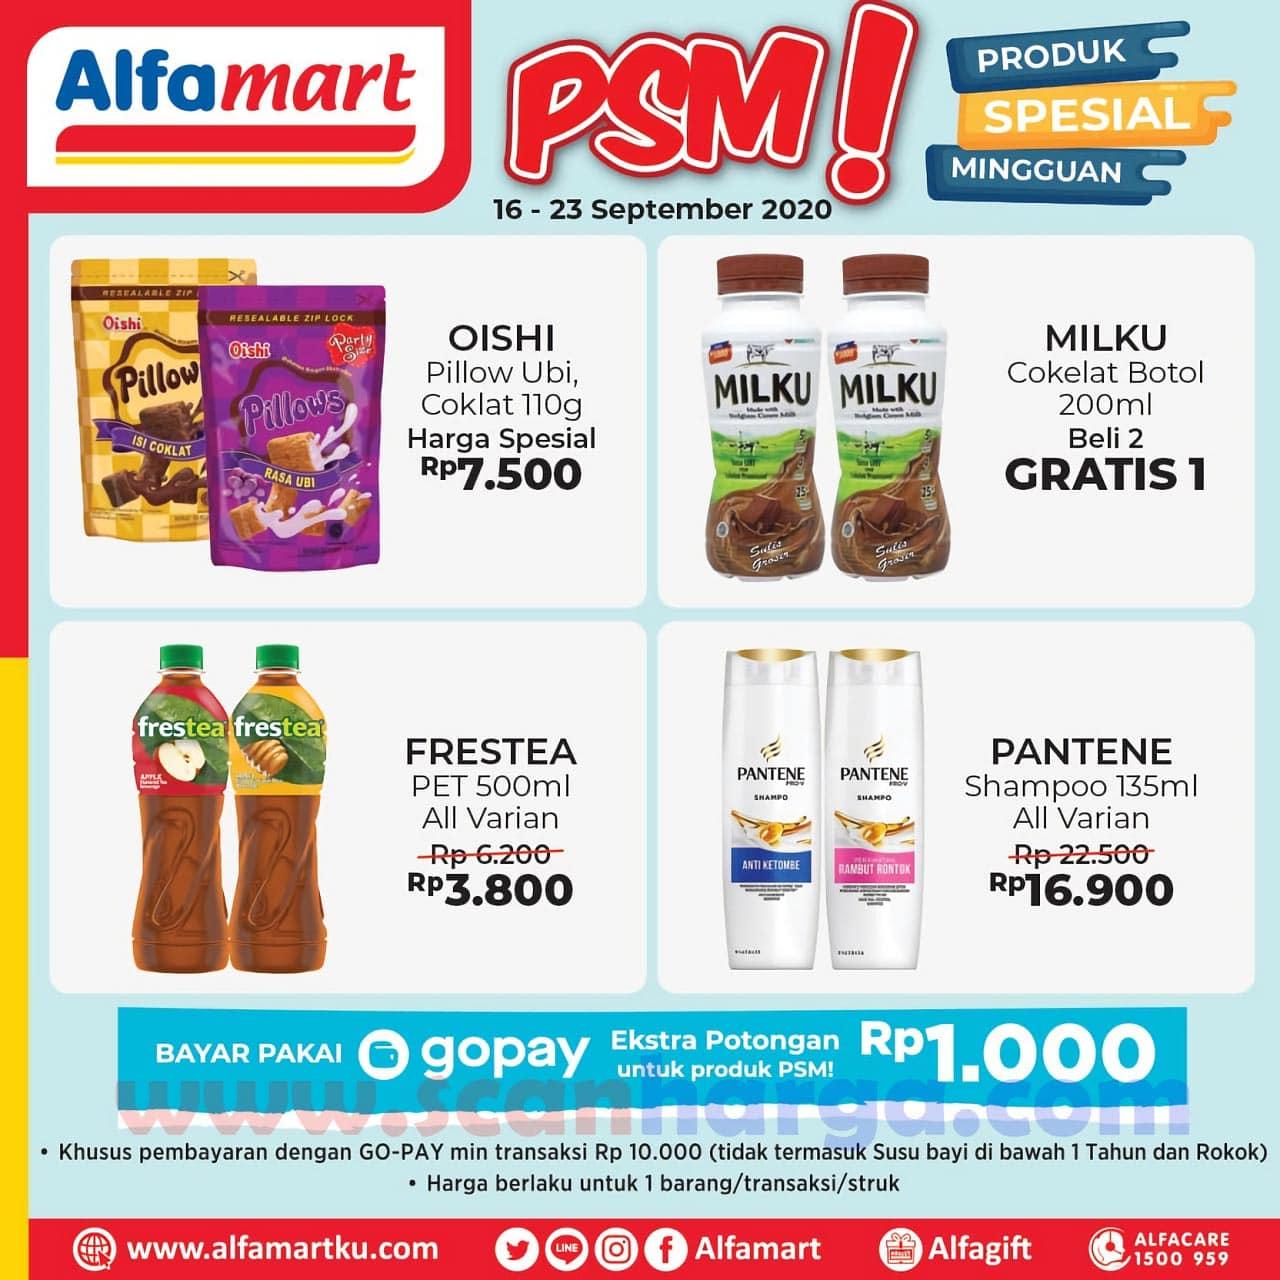 Katalog Promo PSM Alfamart 16 - 23 September 2020